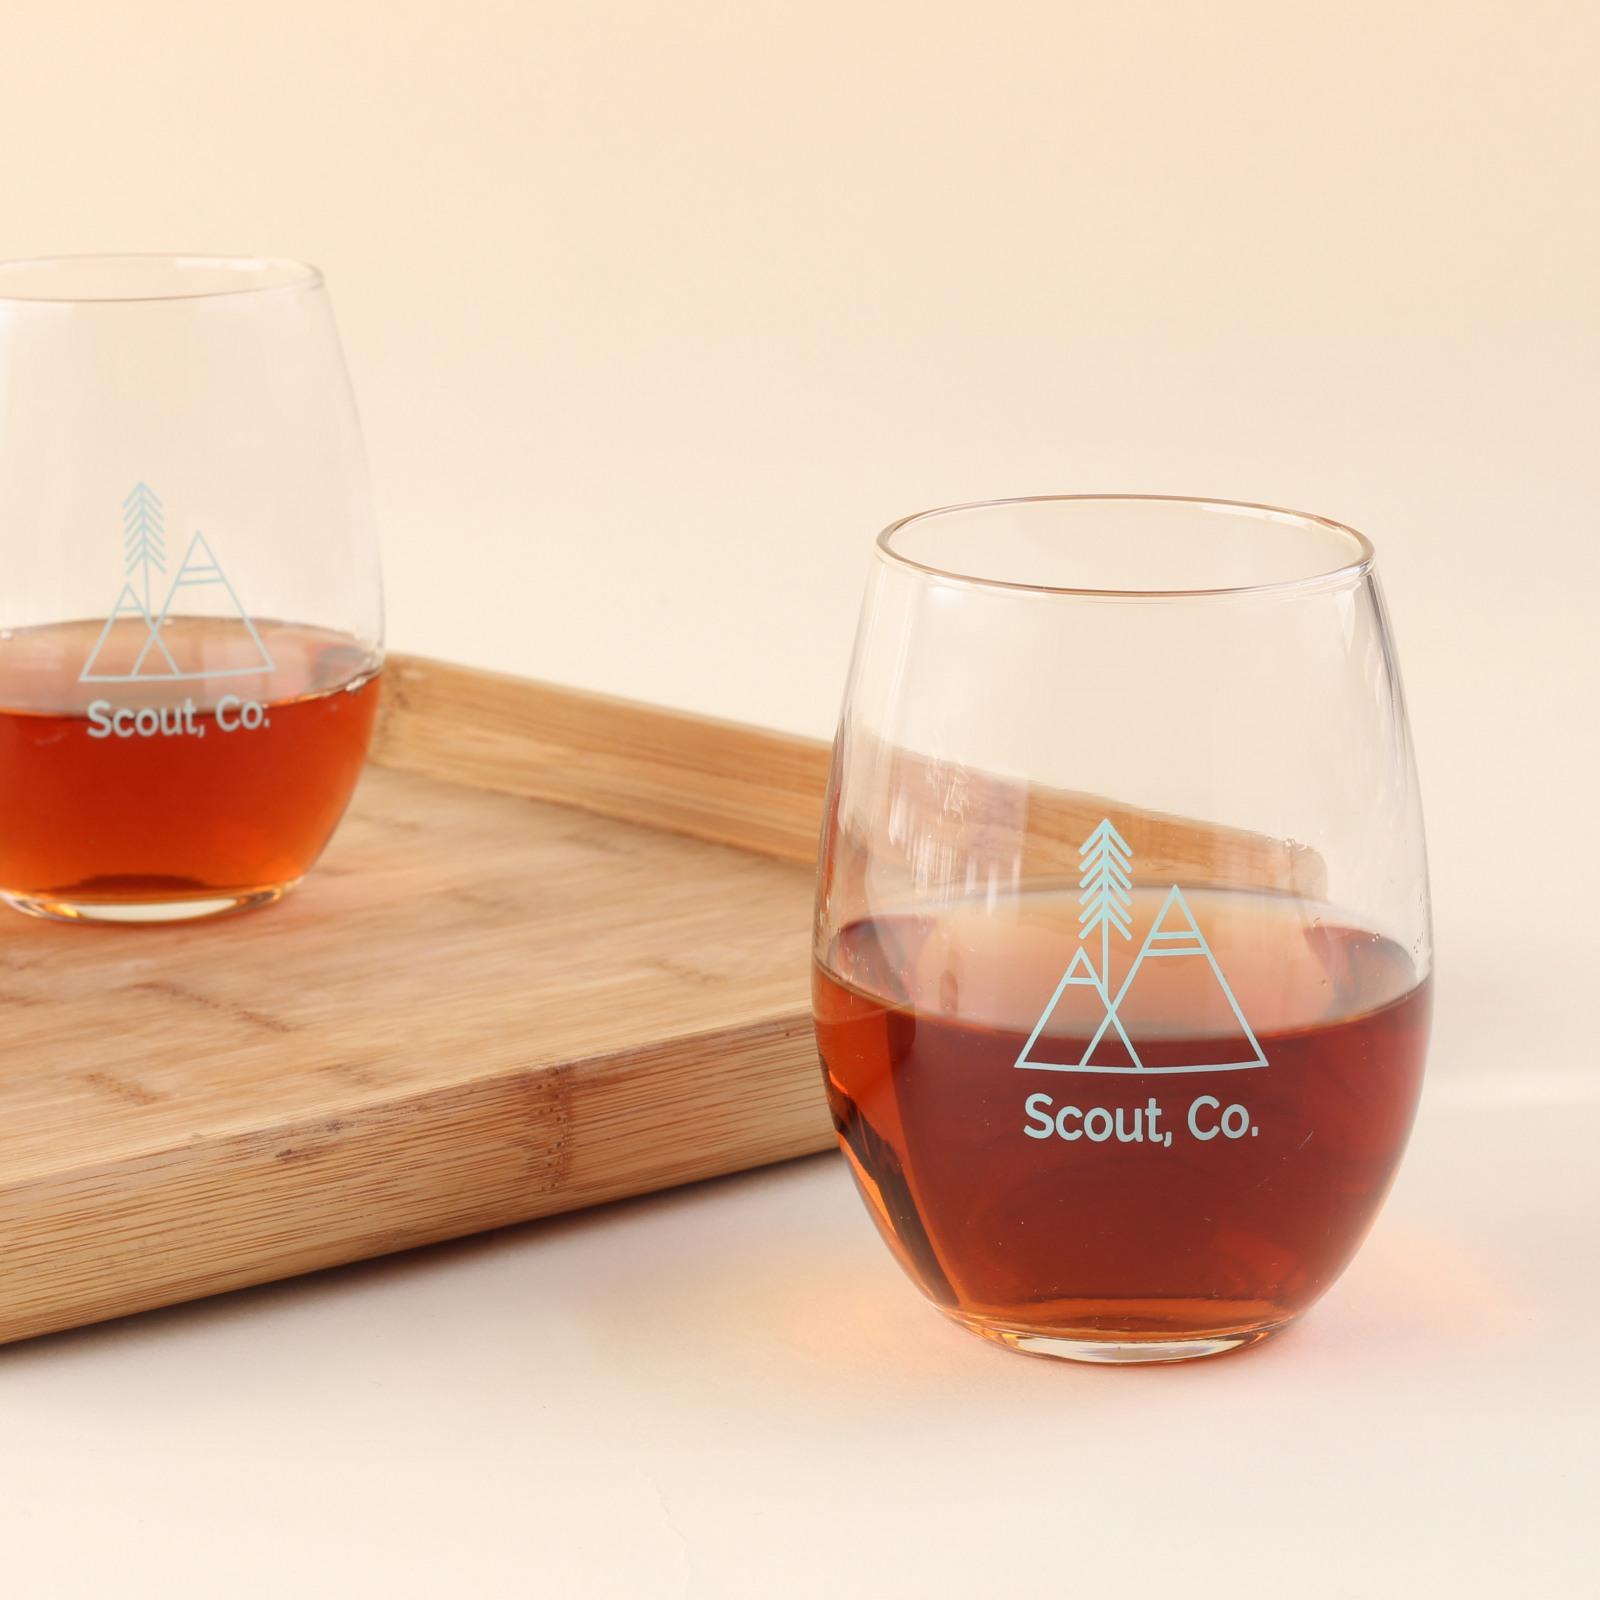 Corporate Logo Stemless Wine Glass 6497